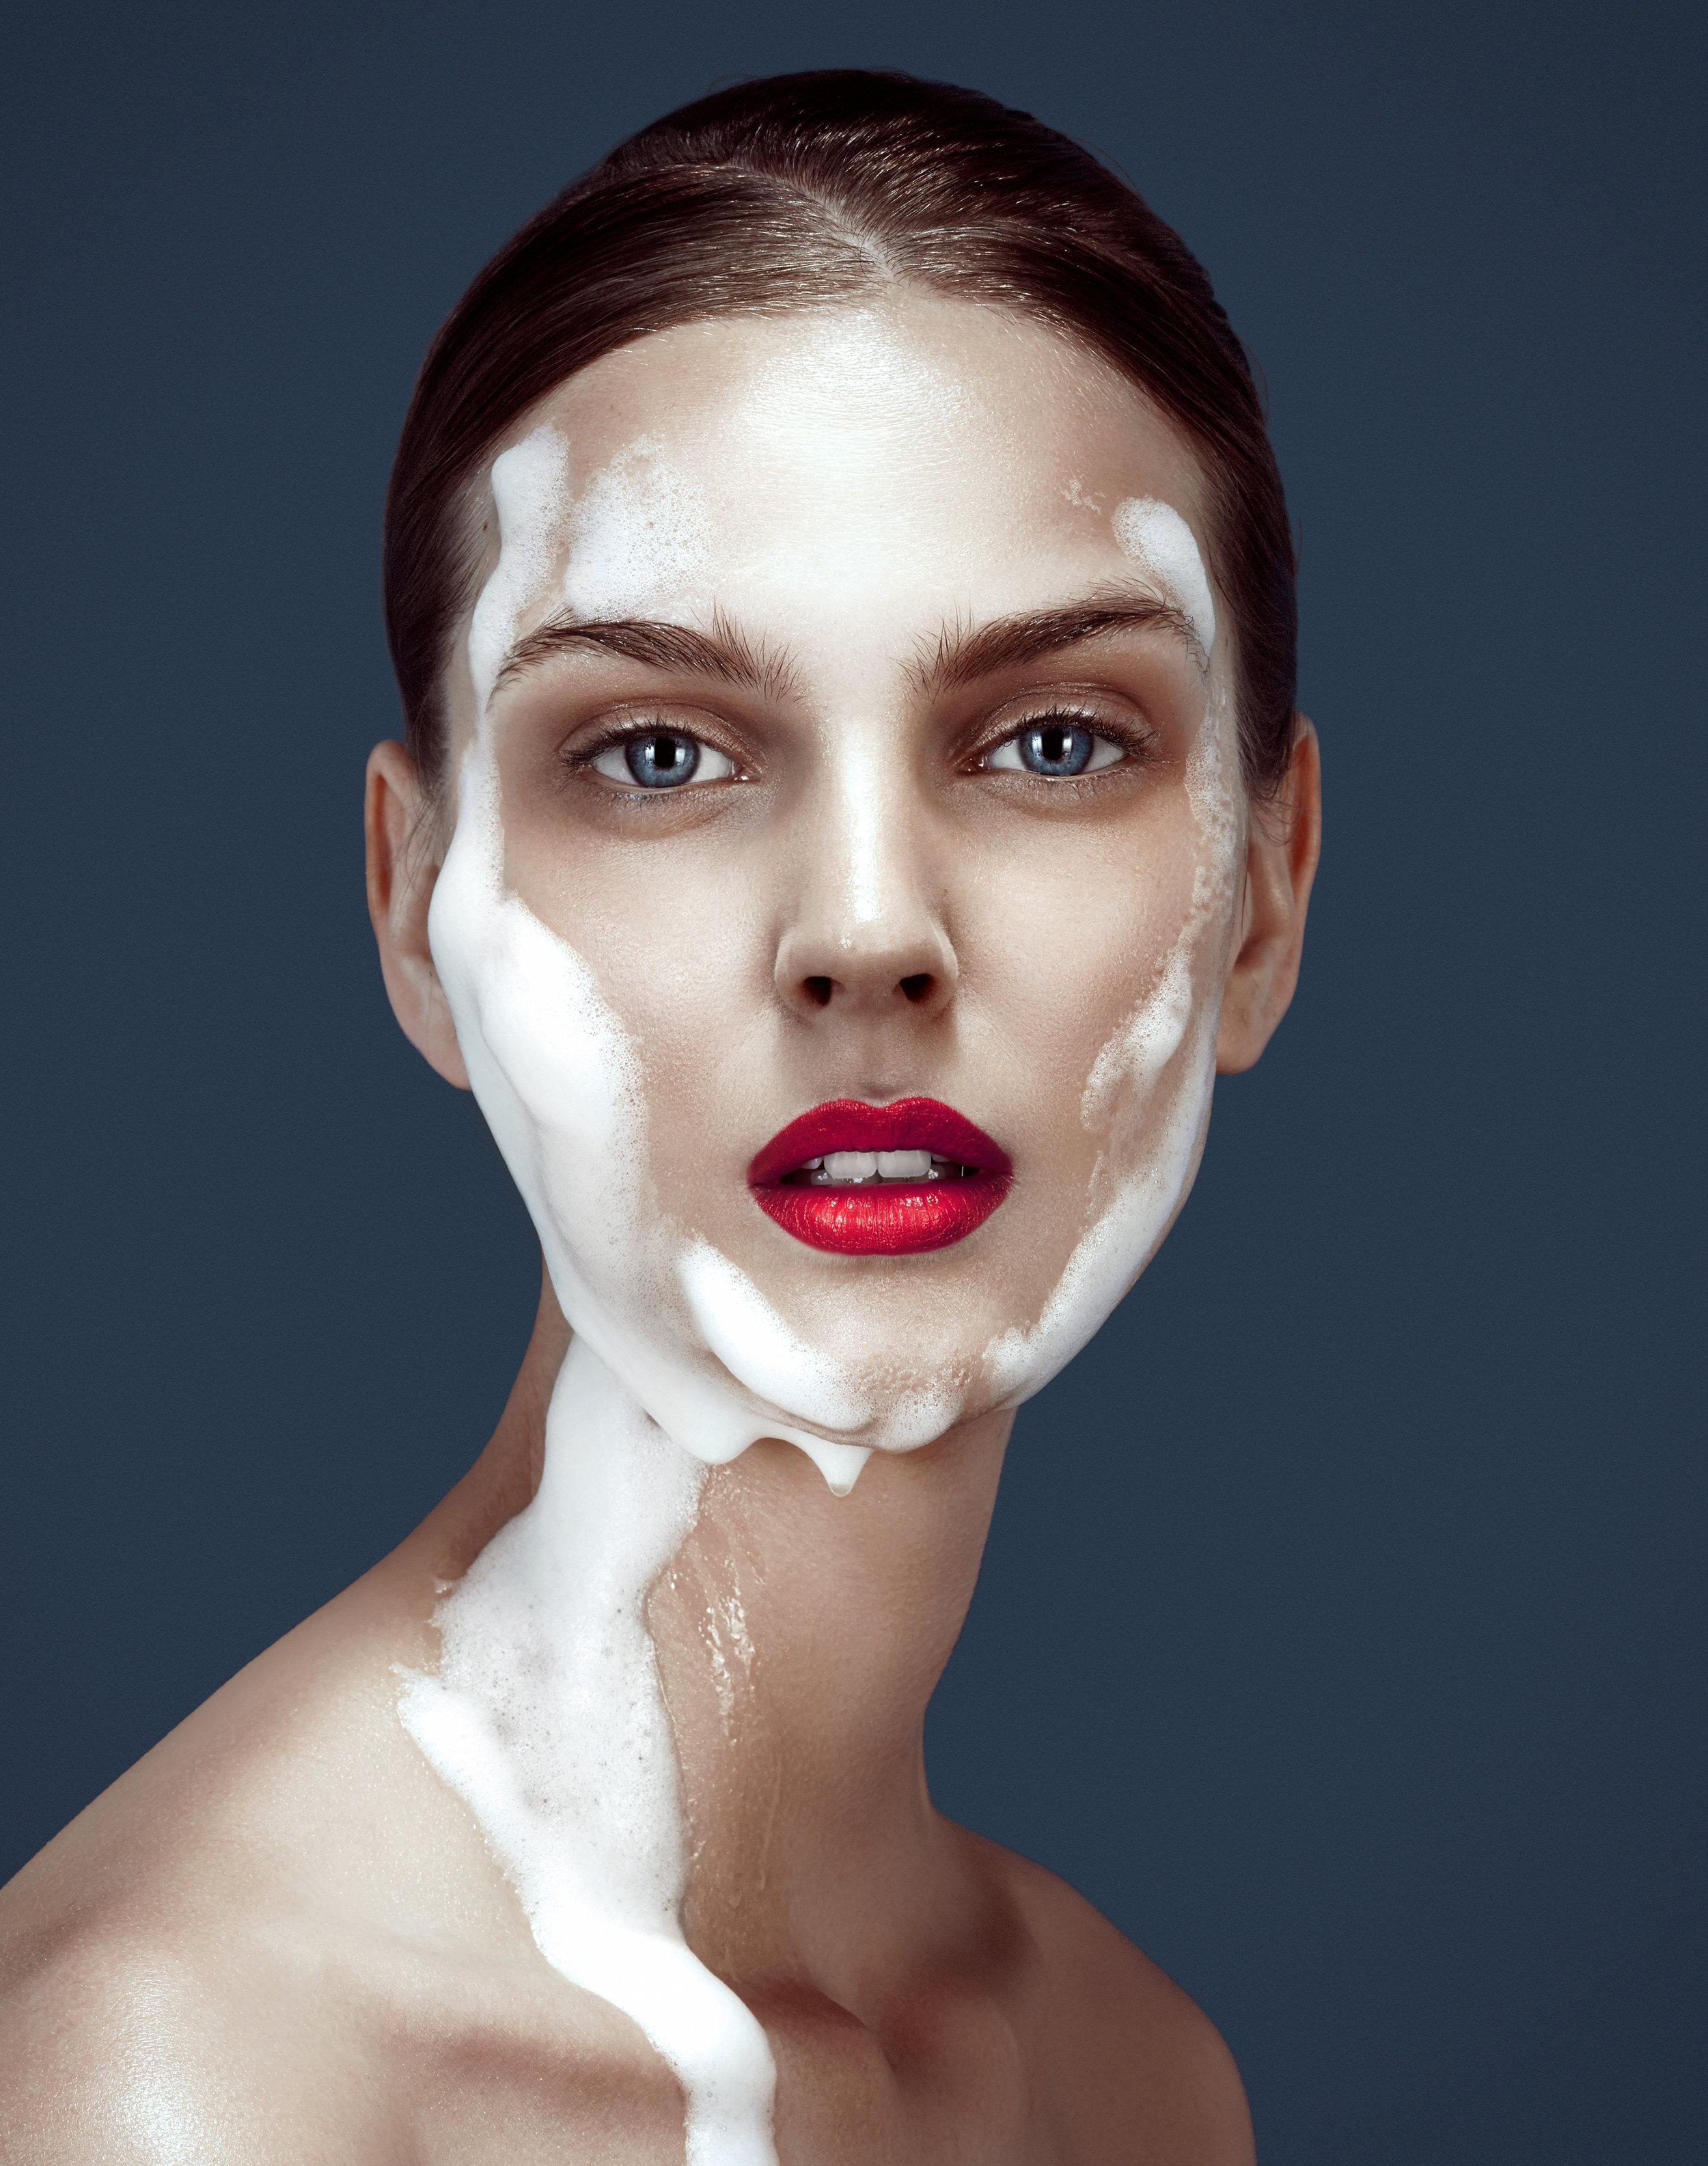 Anna Dabrowska beauty 072.jpg